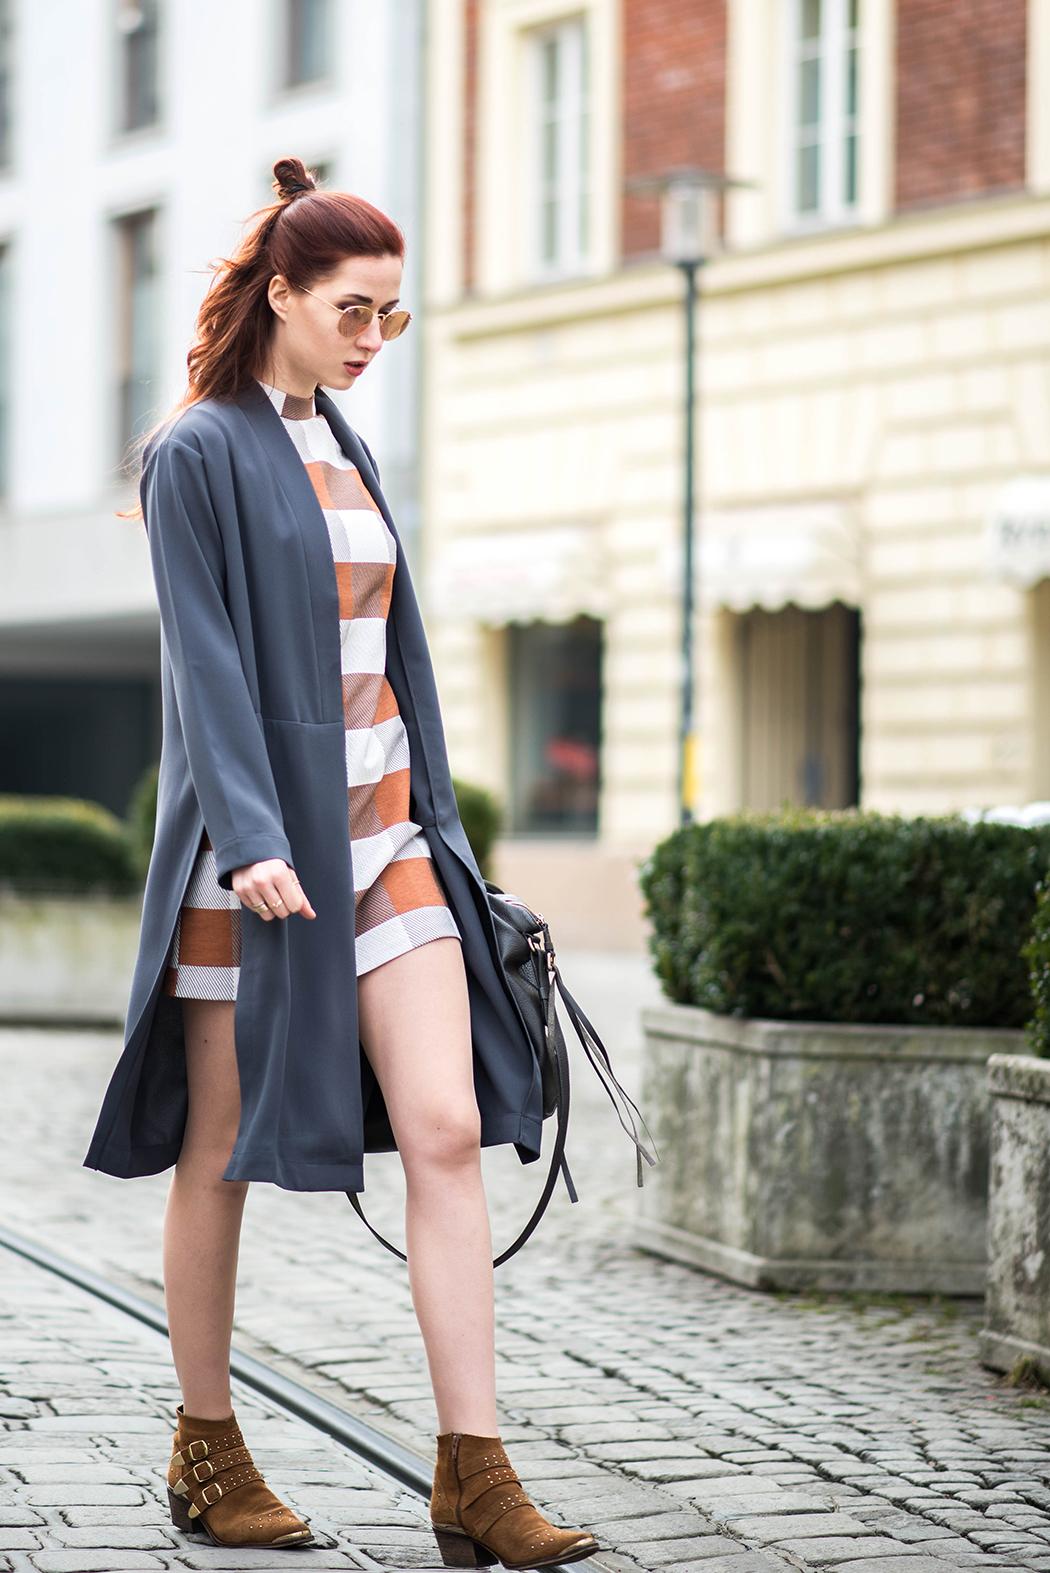 Lindarella-Fashionblog-München-Deutschland-Fashion-Blog-Fashionblogger-Etuikleid-Chloé-Boots-3